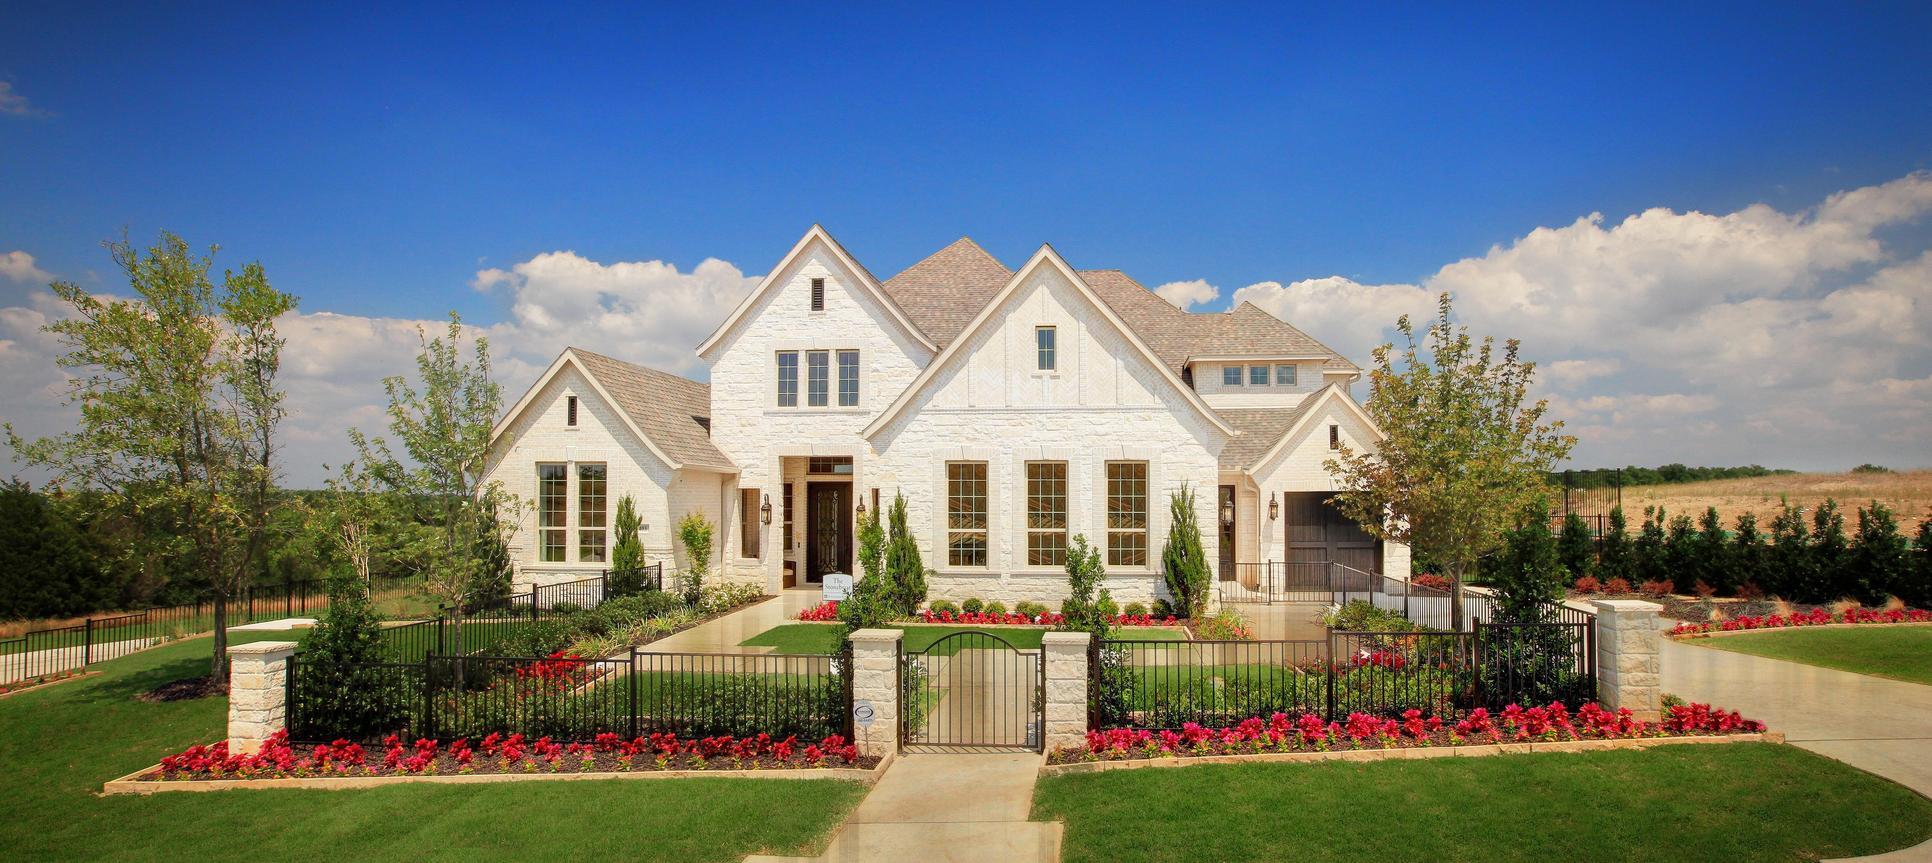 Brockdale:Home Image